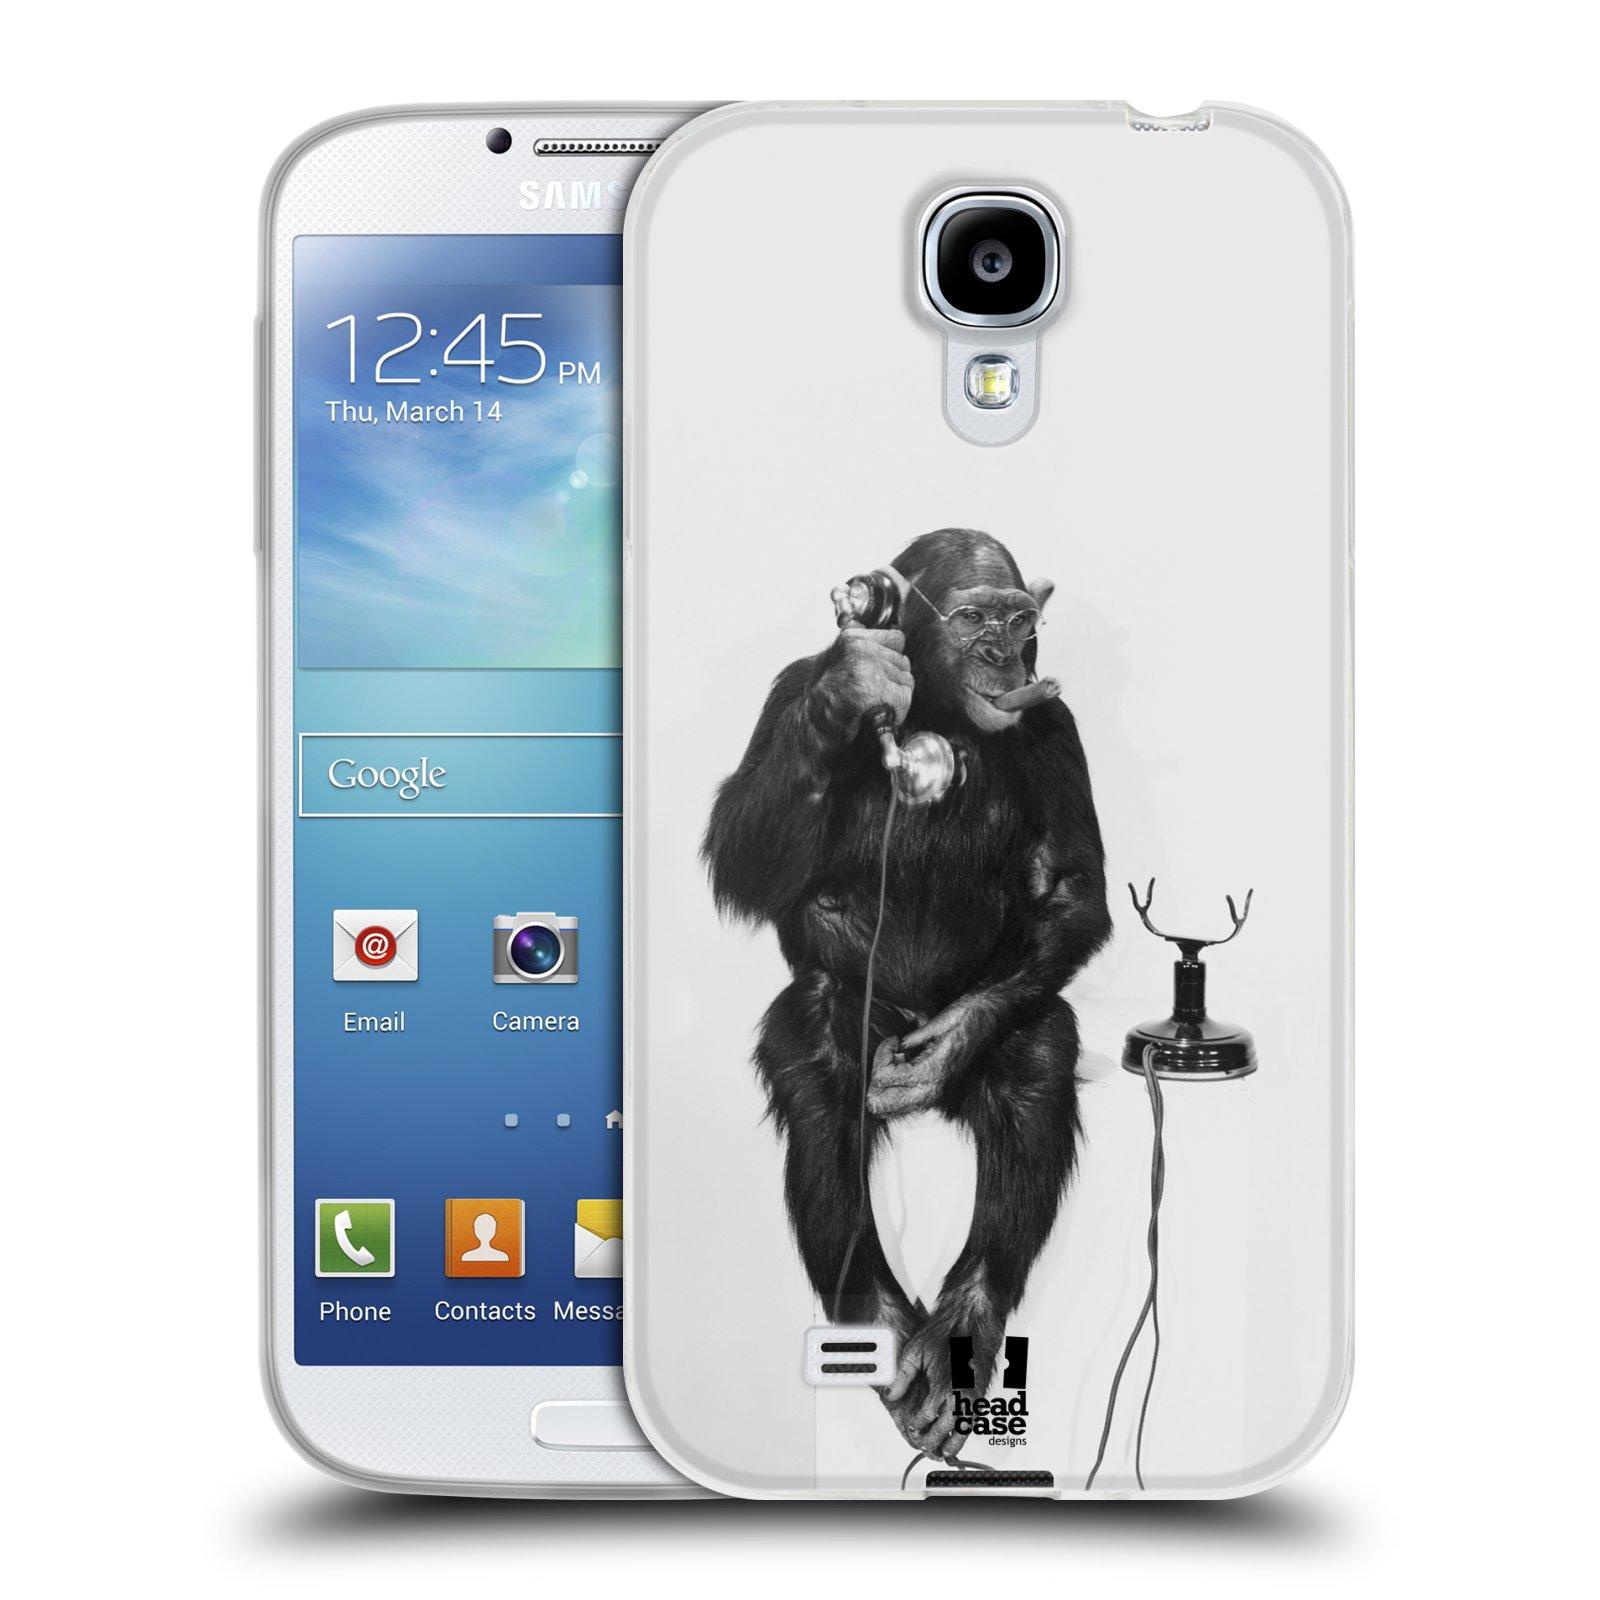 Silikonové pouzdro na mobil Samsung Galaxy S4 HEAD CASE OPIČÁK S TELEFONEM (Silikonový kryt či obal na mobilní telefon Samsung Galaxy S4 GT-i9505 / i9500)